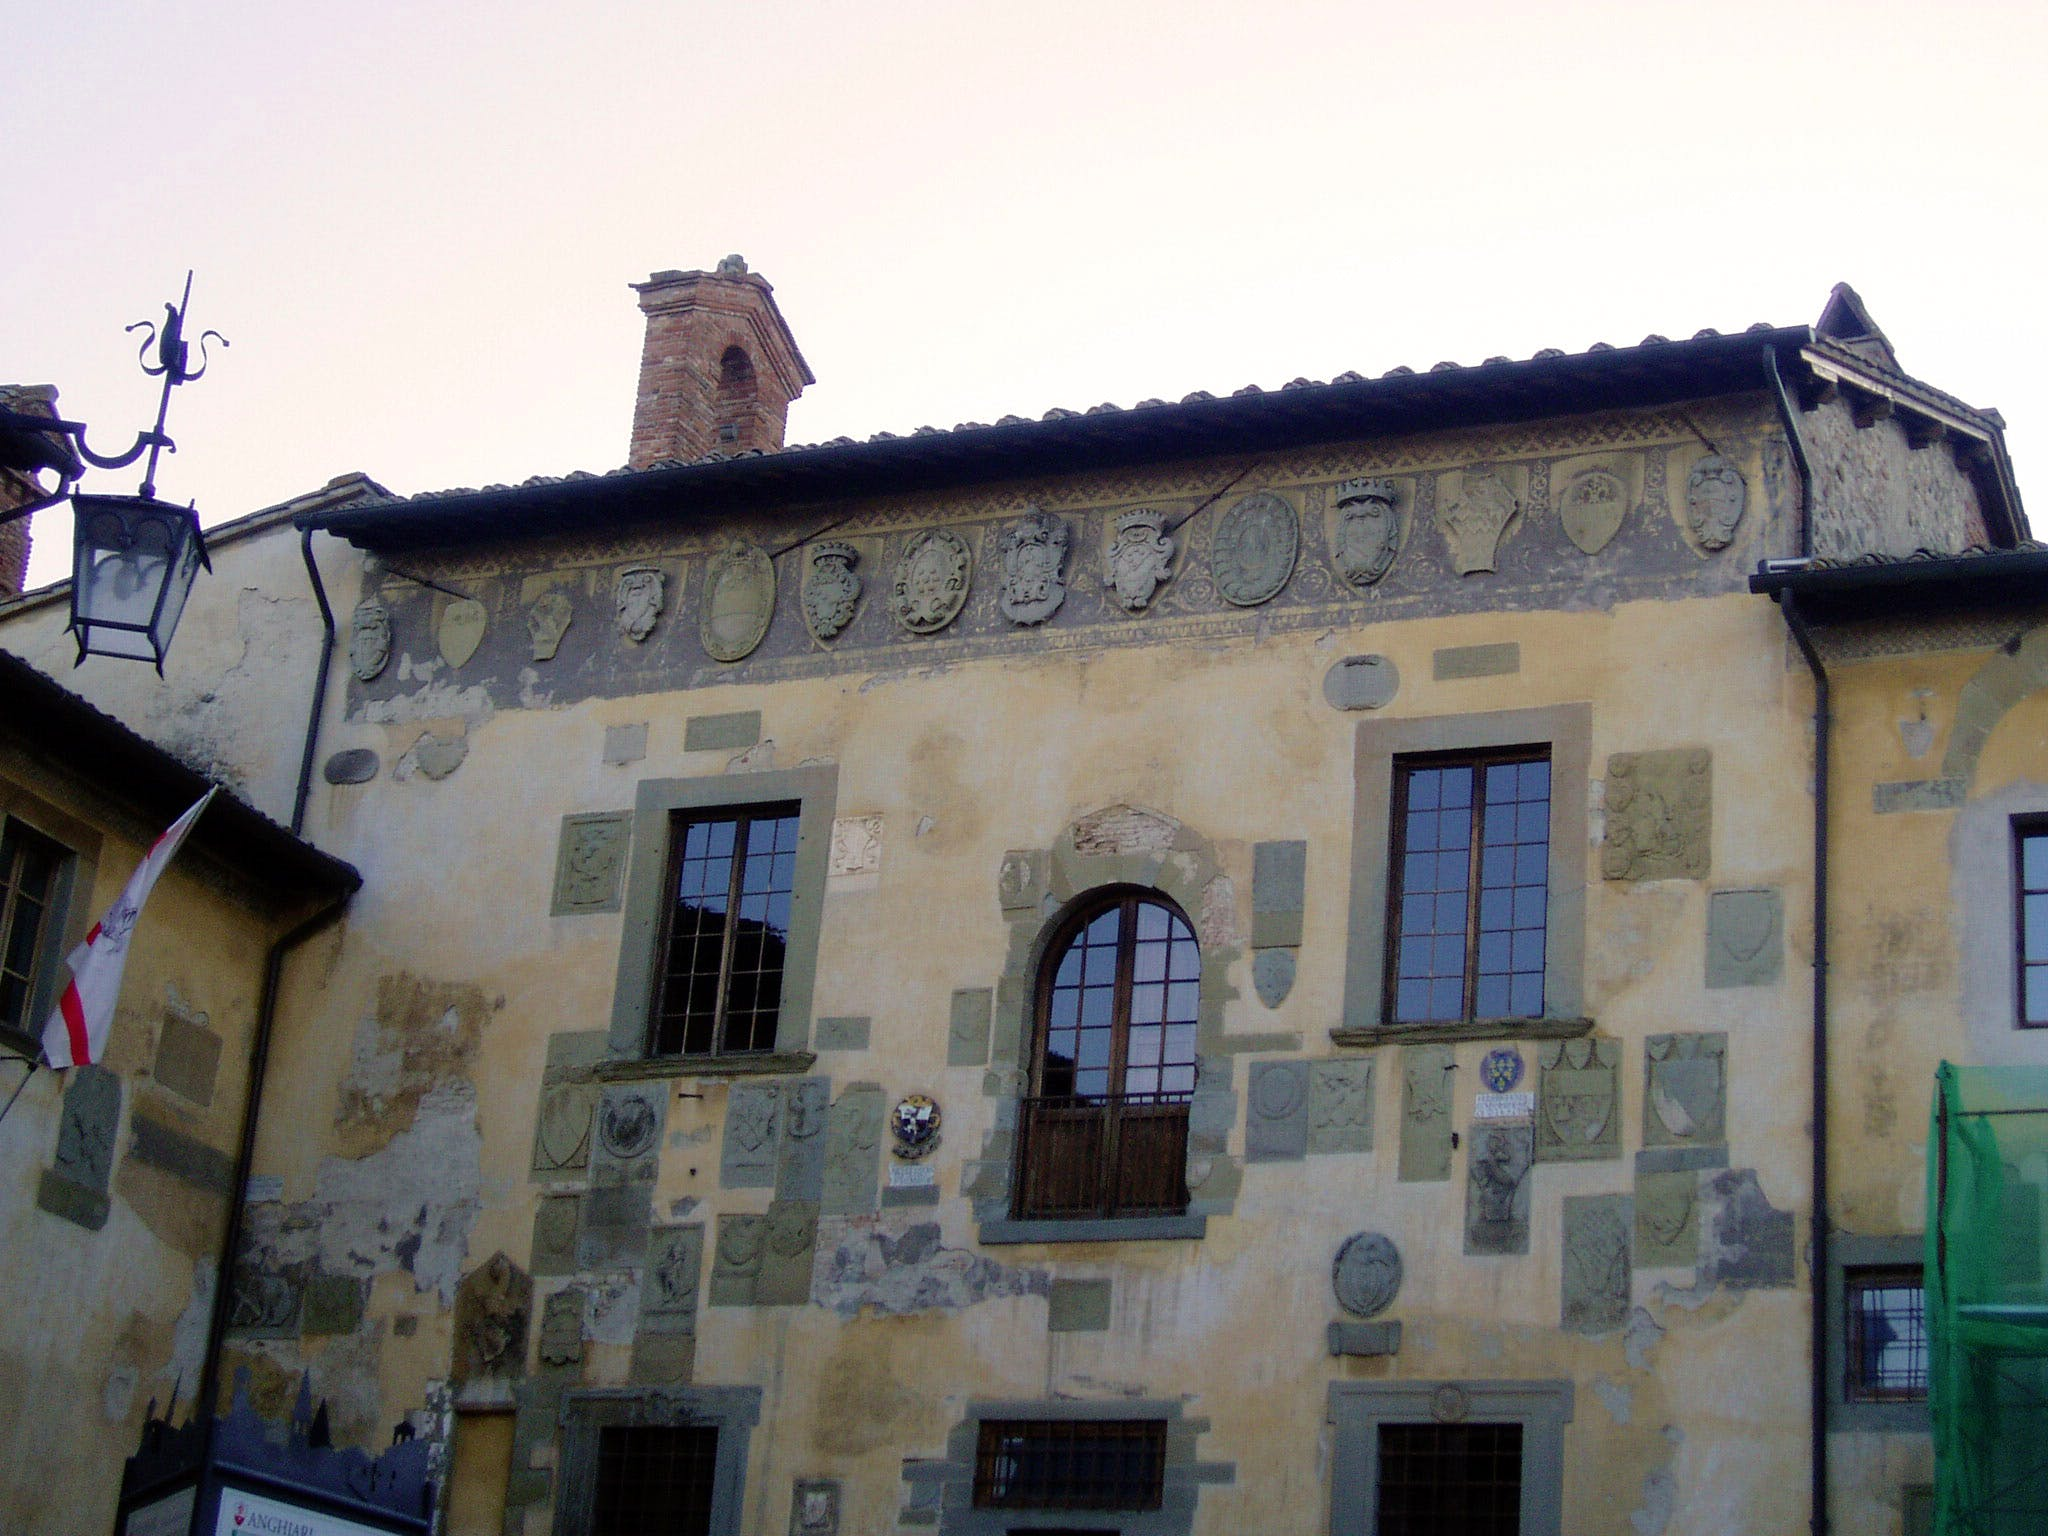 Anghiari Italy Map.Anghiari Visit Medieval City Of Anghiari In Tuscany